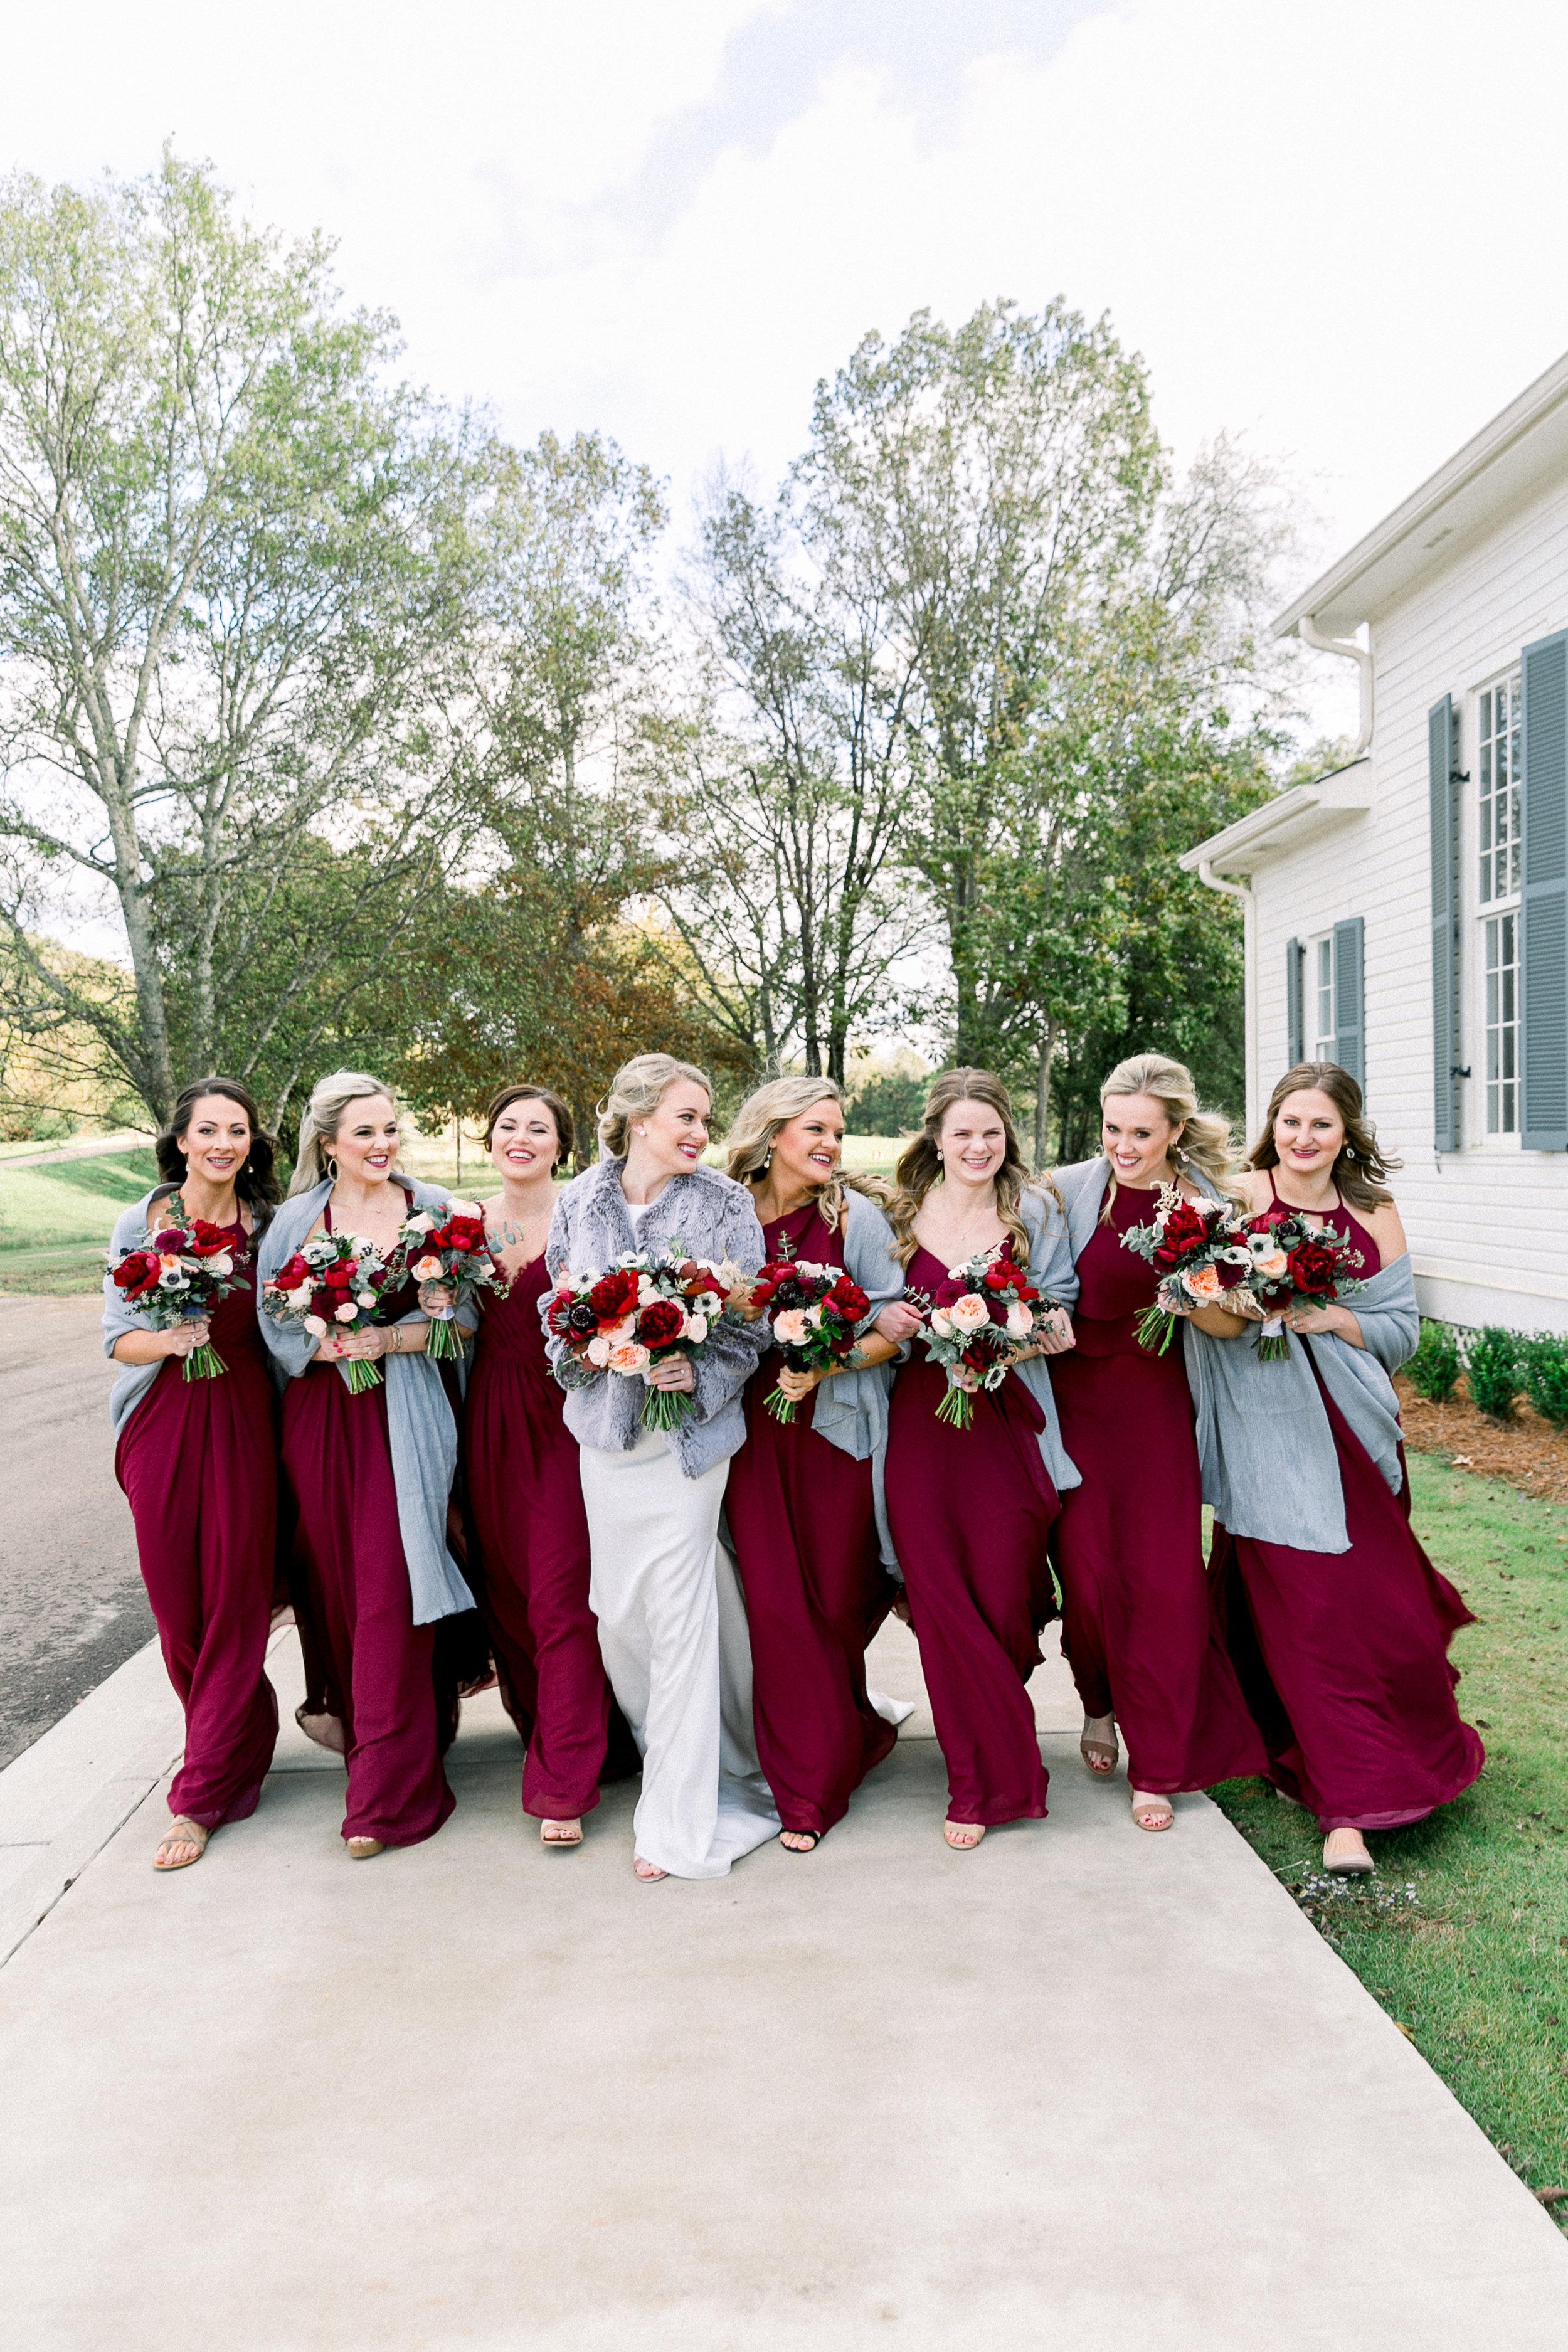 344_Rachel & Drew Wedding__Ports_Lindsay Ott Photog_2018.jpg